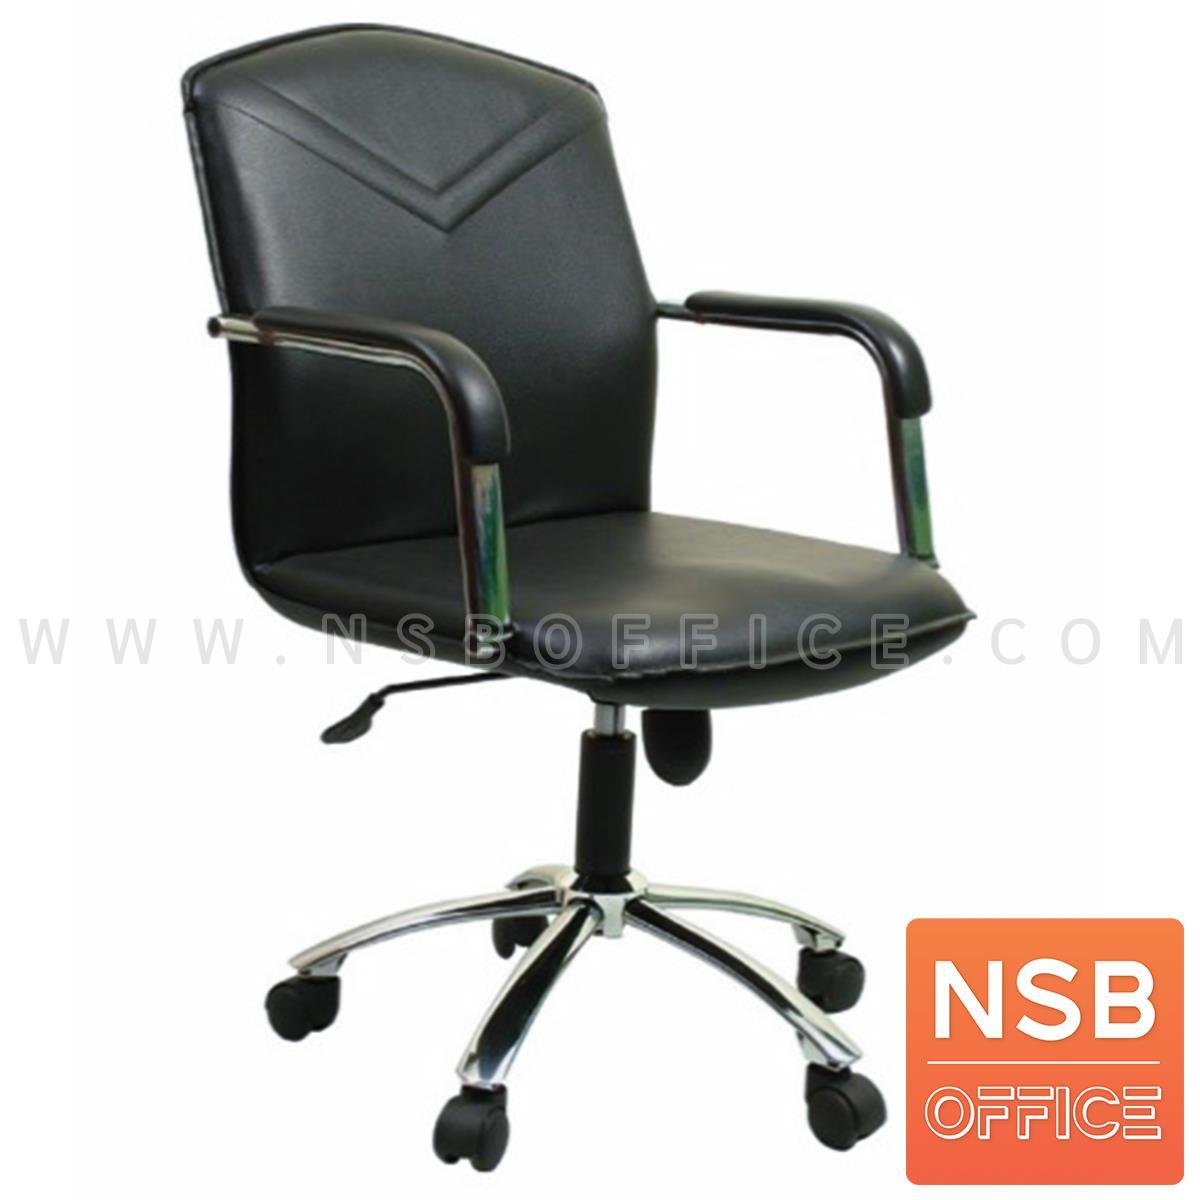 B03A283:เก้าอี้สำนักงาน รุ่น Mycroft (ไมครอฟต์)  โช๊คแก๊ส มีก้อนโยก ขาเหล็กชุบโครเมี่ยม